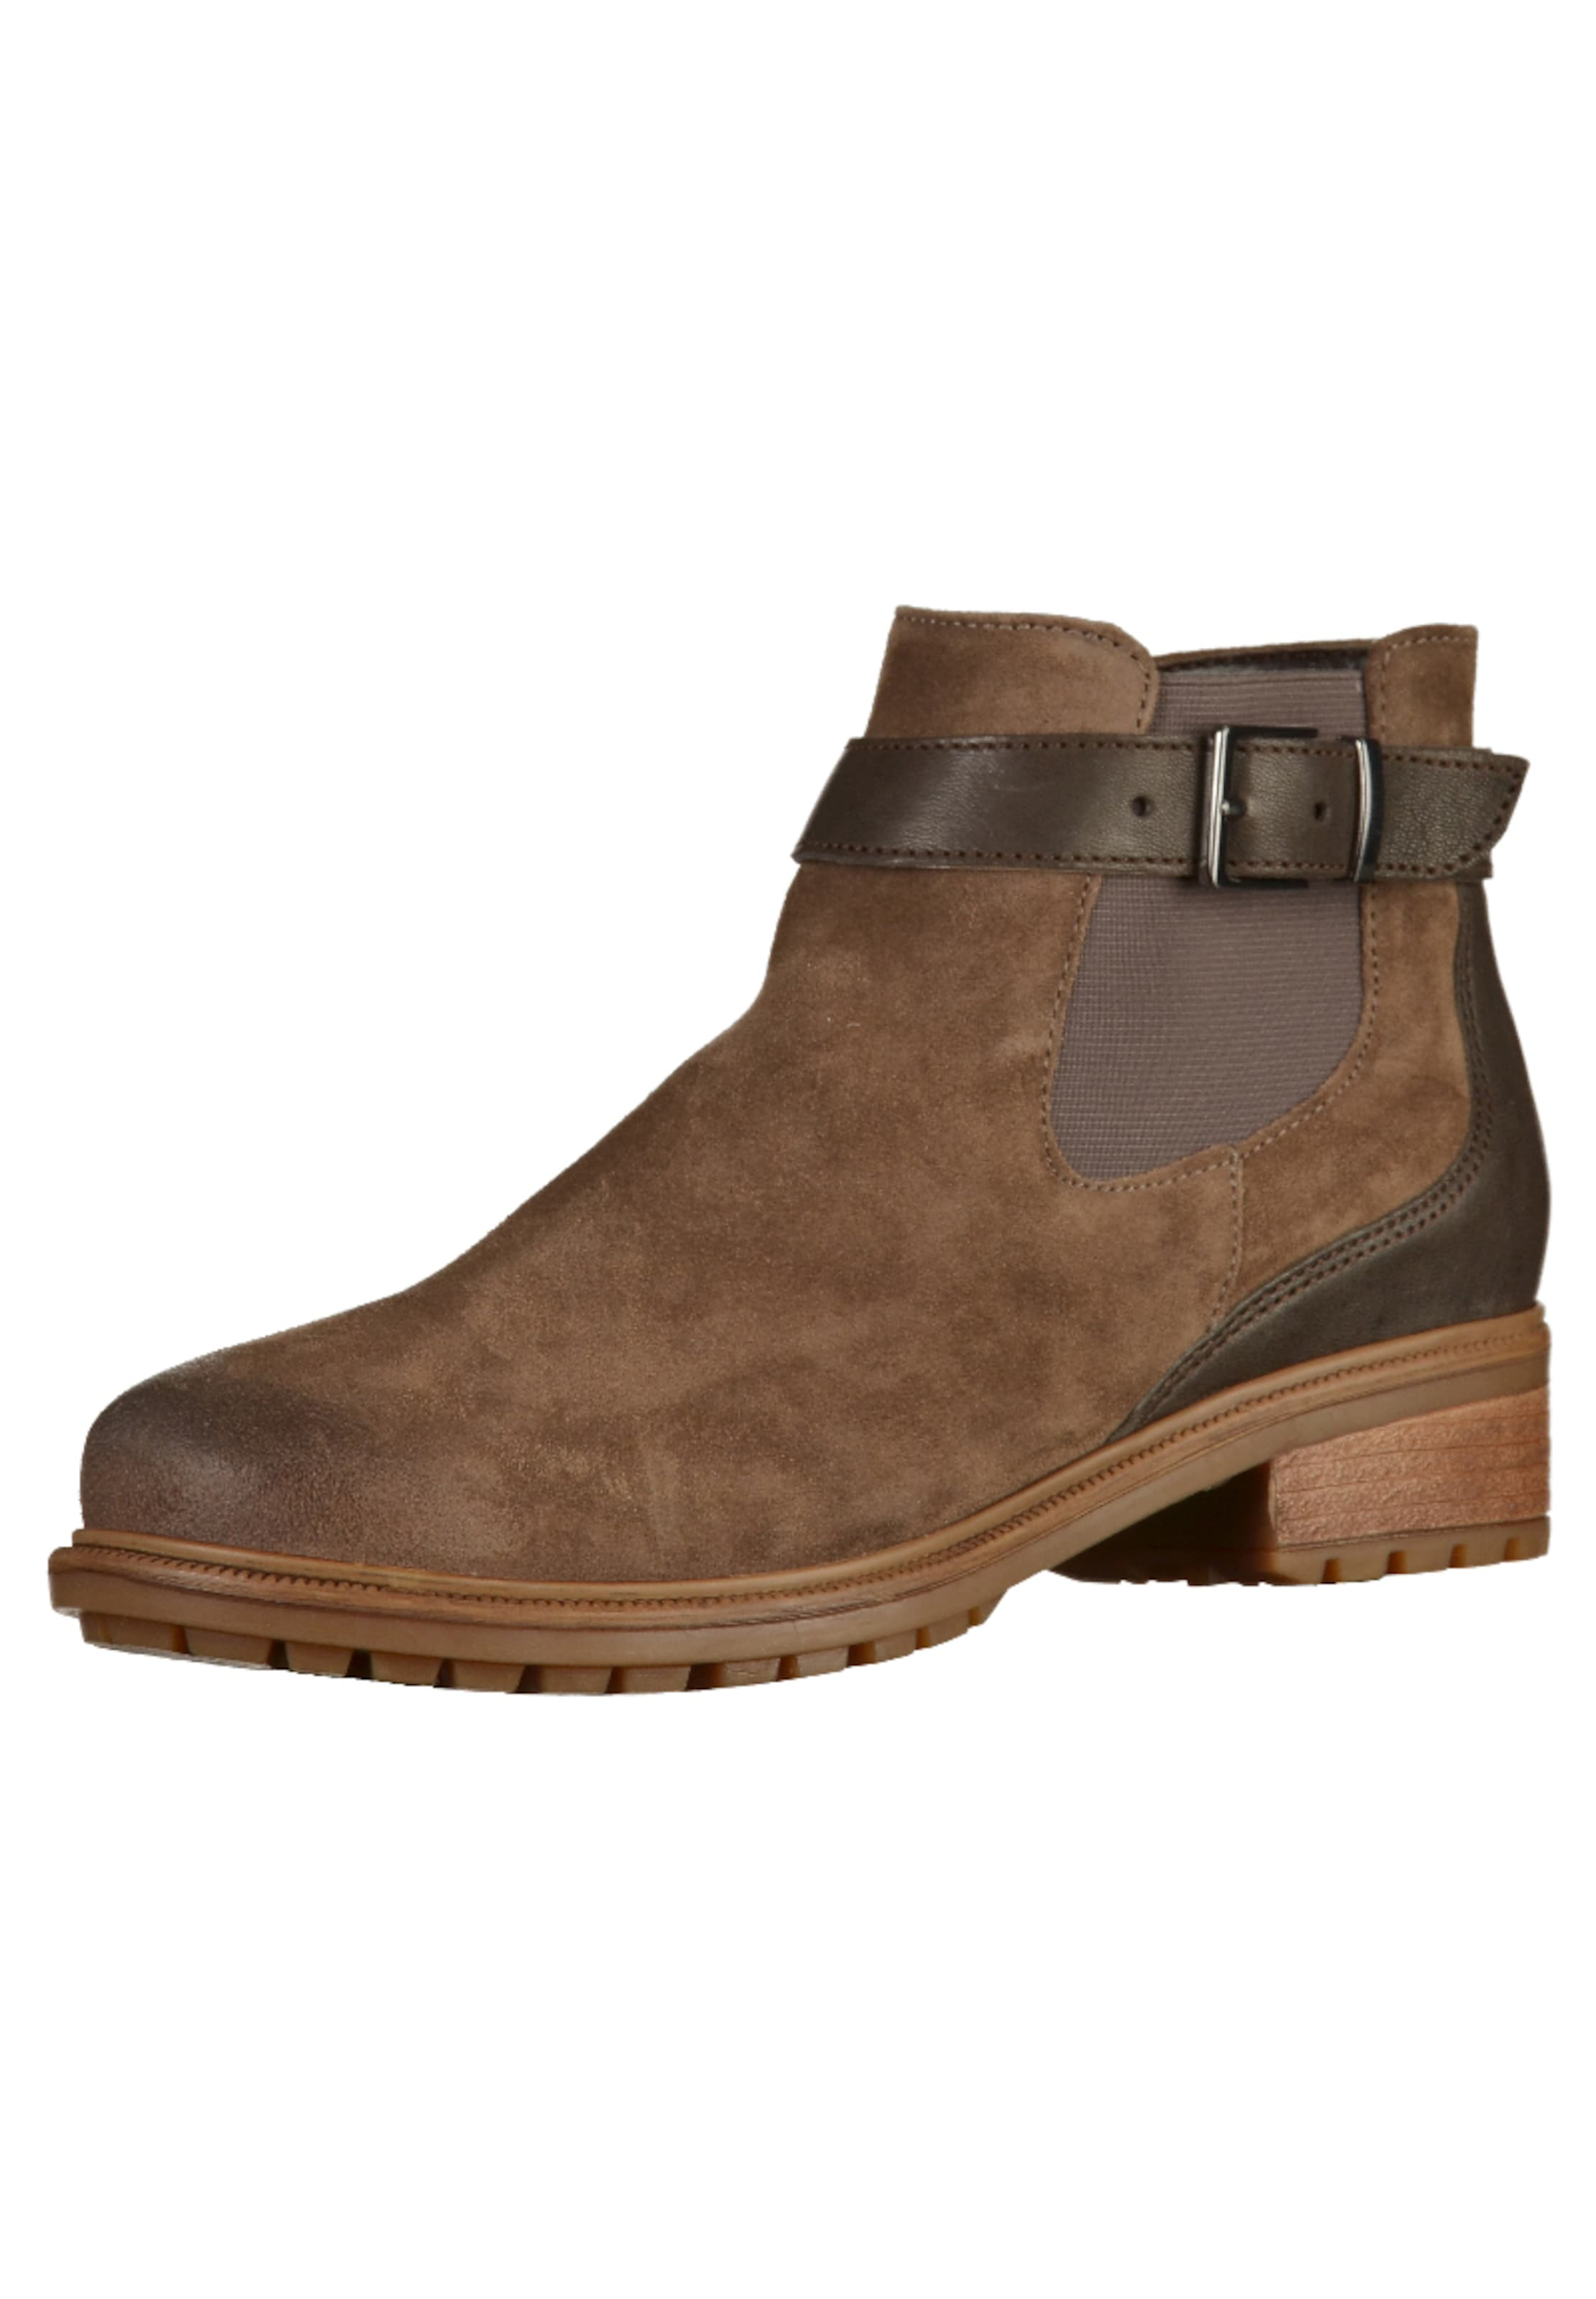 ARA Chelsea Boots  Kansas